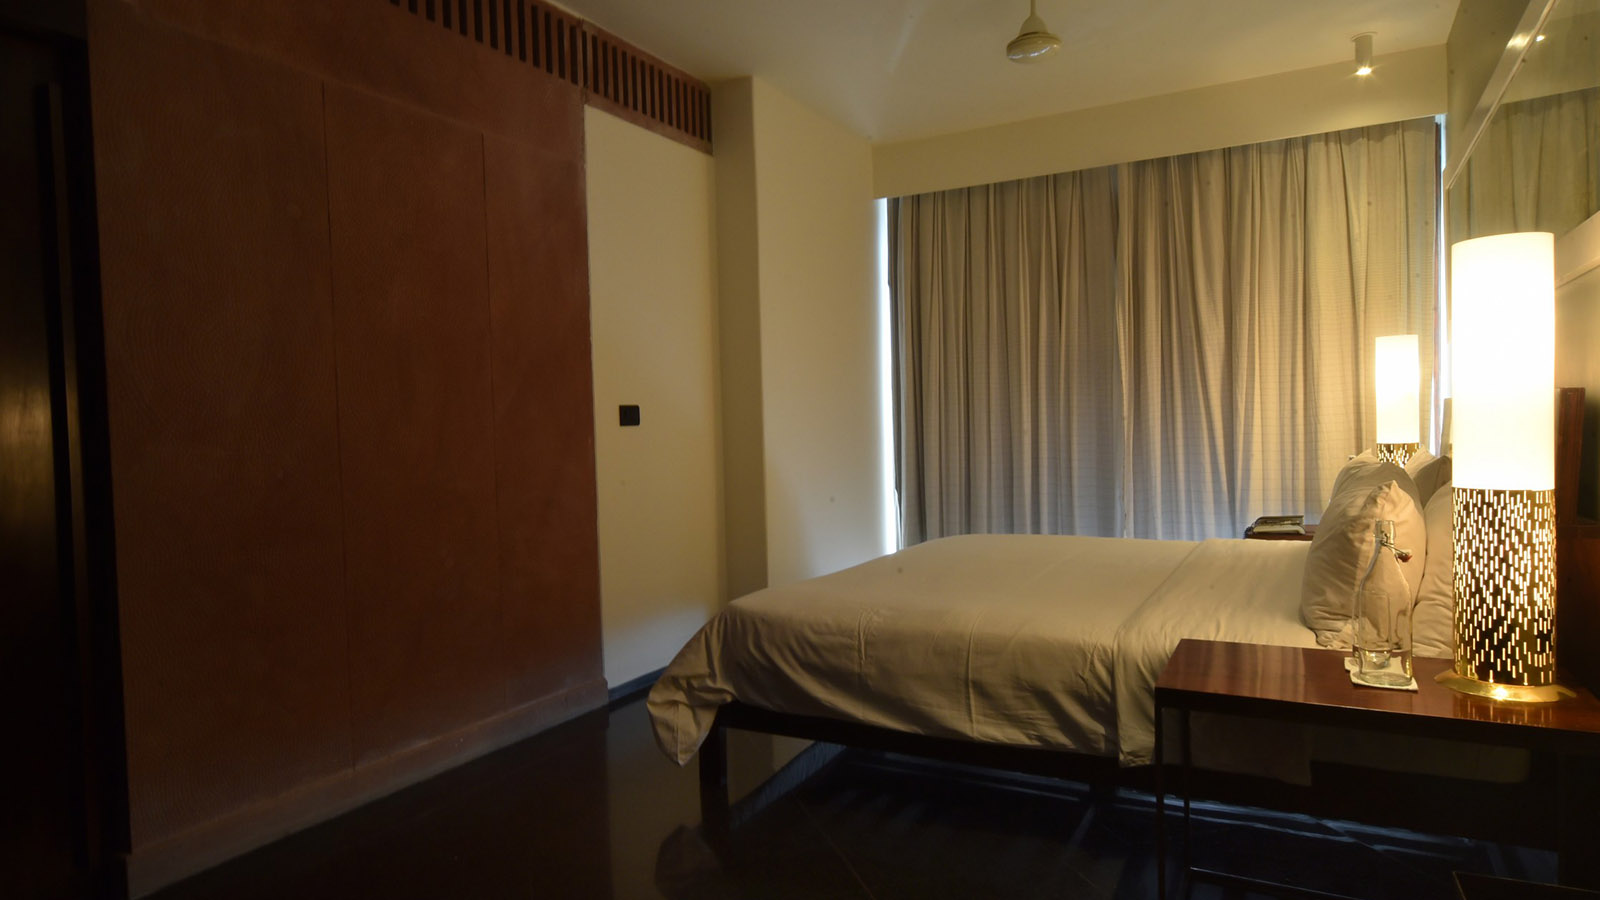 Duplex-Suite-RAAS-Hotel-Jodhpur-Rajasthan